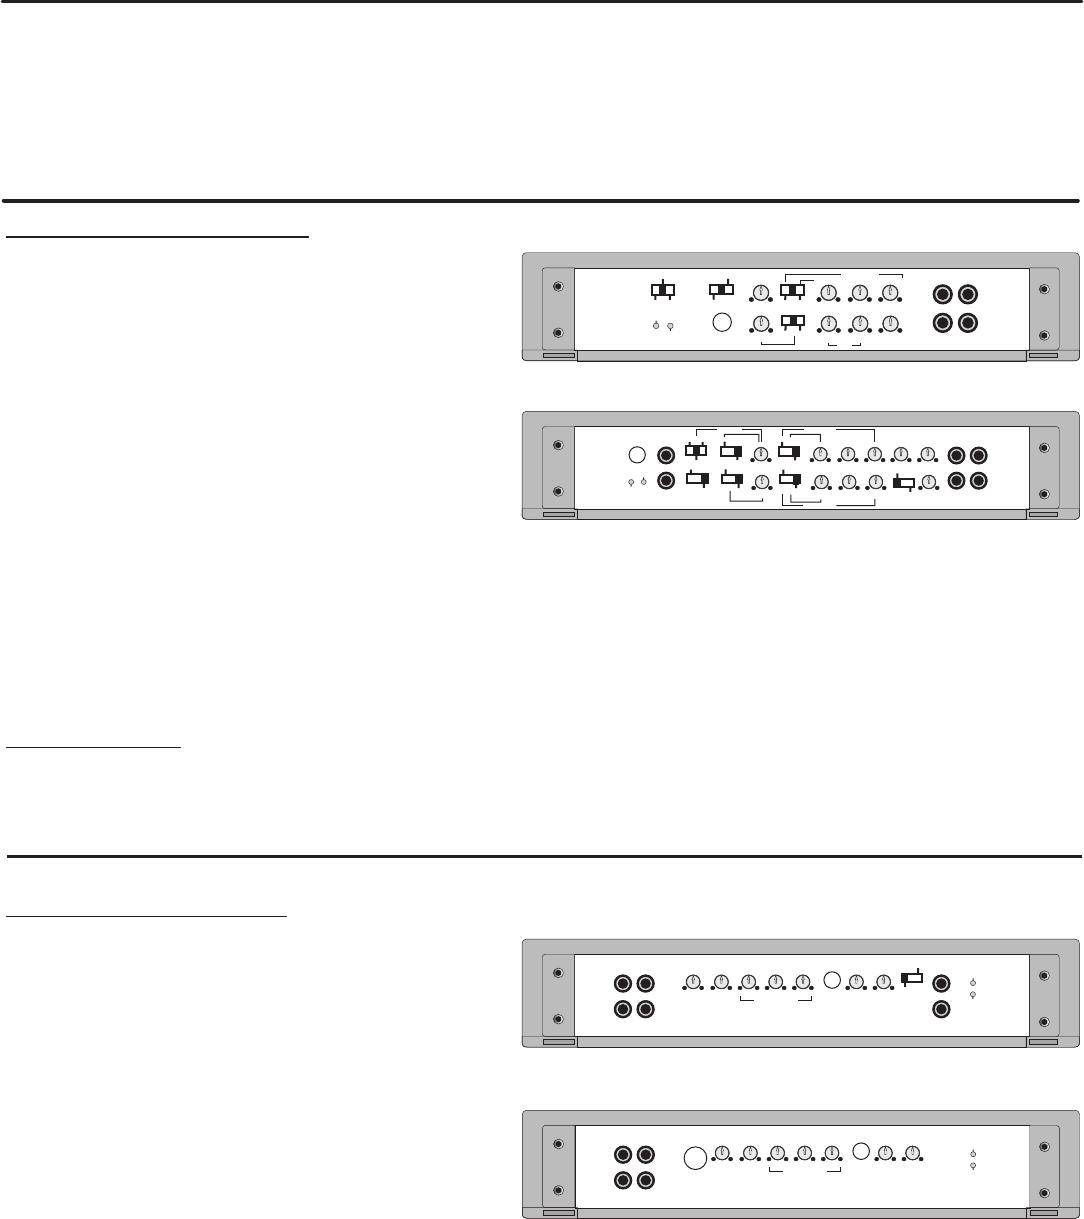 Handleiding Hifonics Mt Olympus Pagina 4 Van 17 English Amp Wiring Diagram